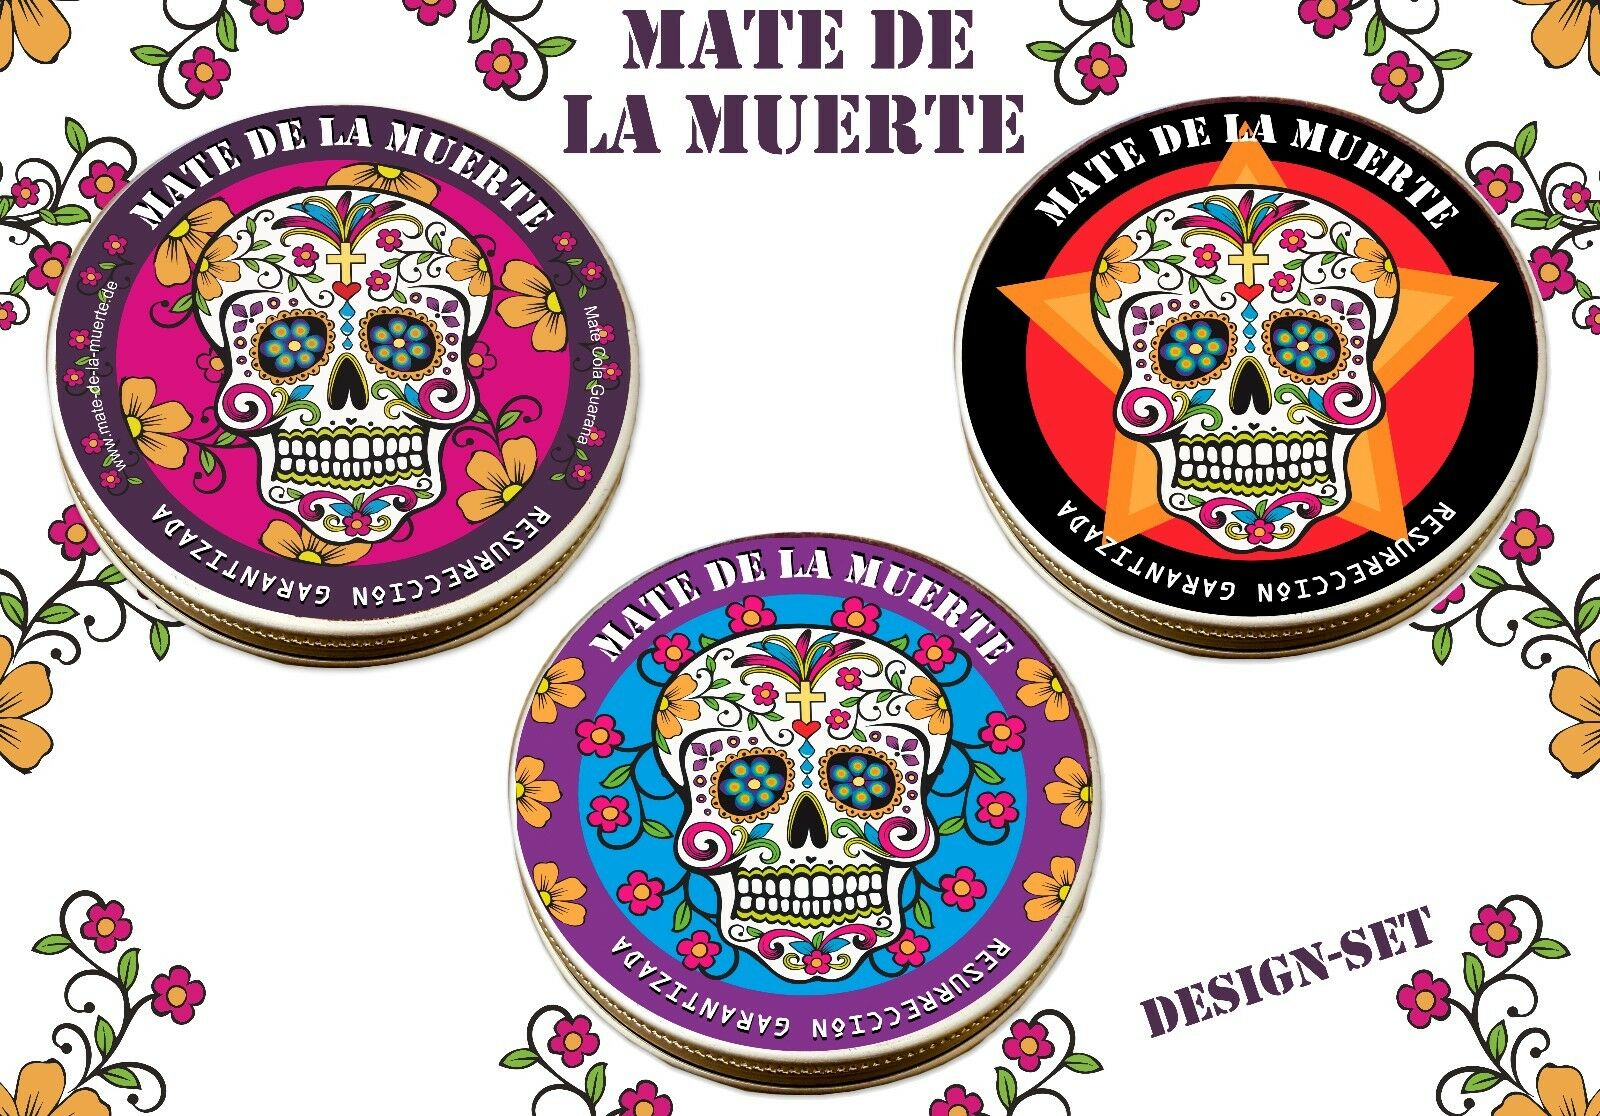 Mate de la Muerte - Mate Tee mit Guarana und Colanuss Designset - Super Geschenk